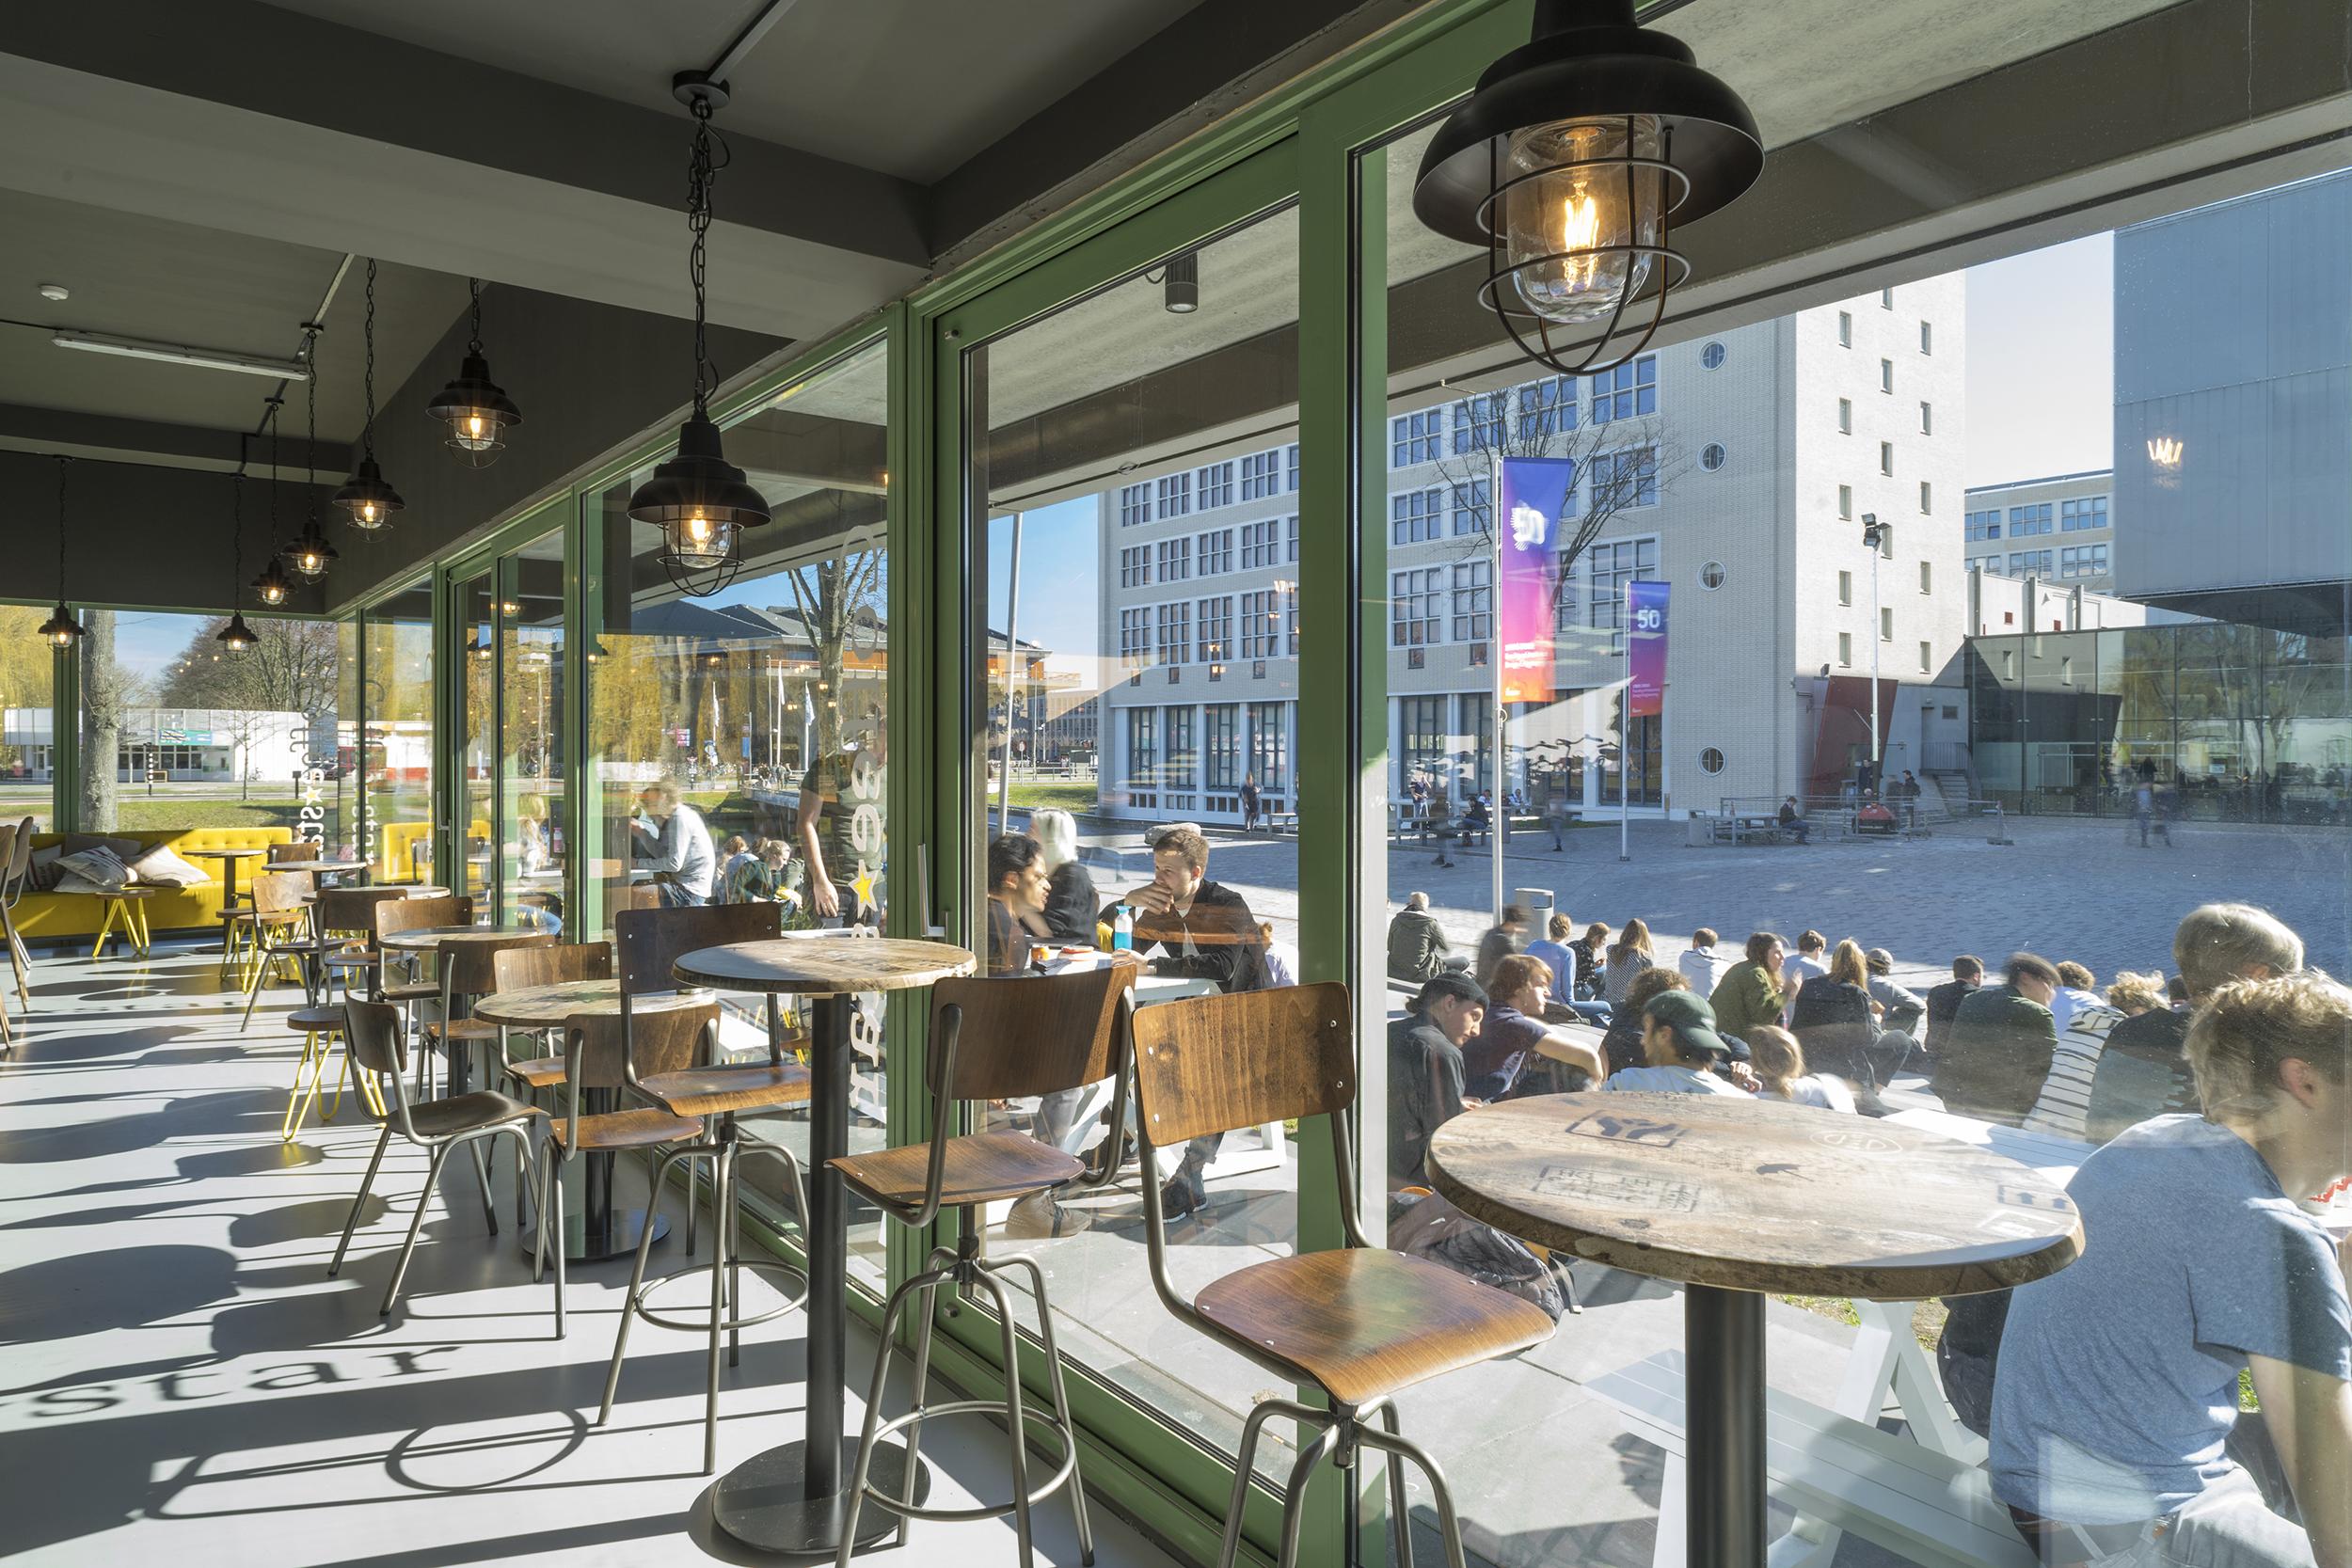 <p>Coffee and Bikes Delft door Biq-BureauVanEig, beeld Riccardo de Vecchi</p>